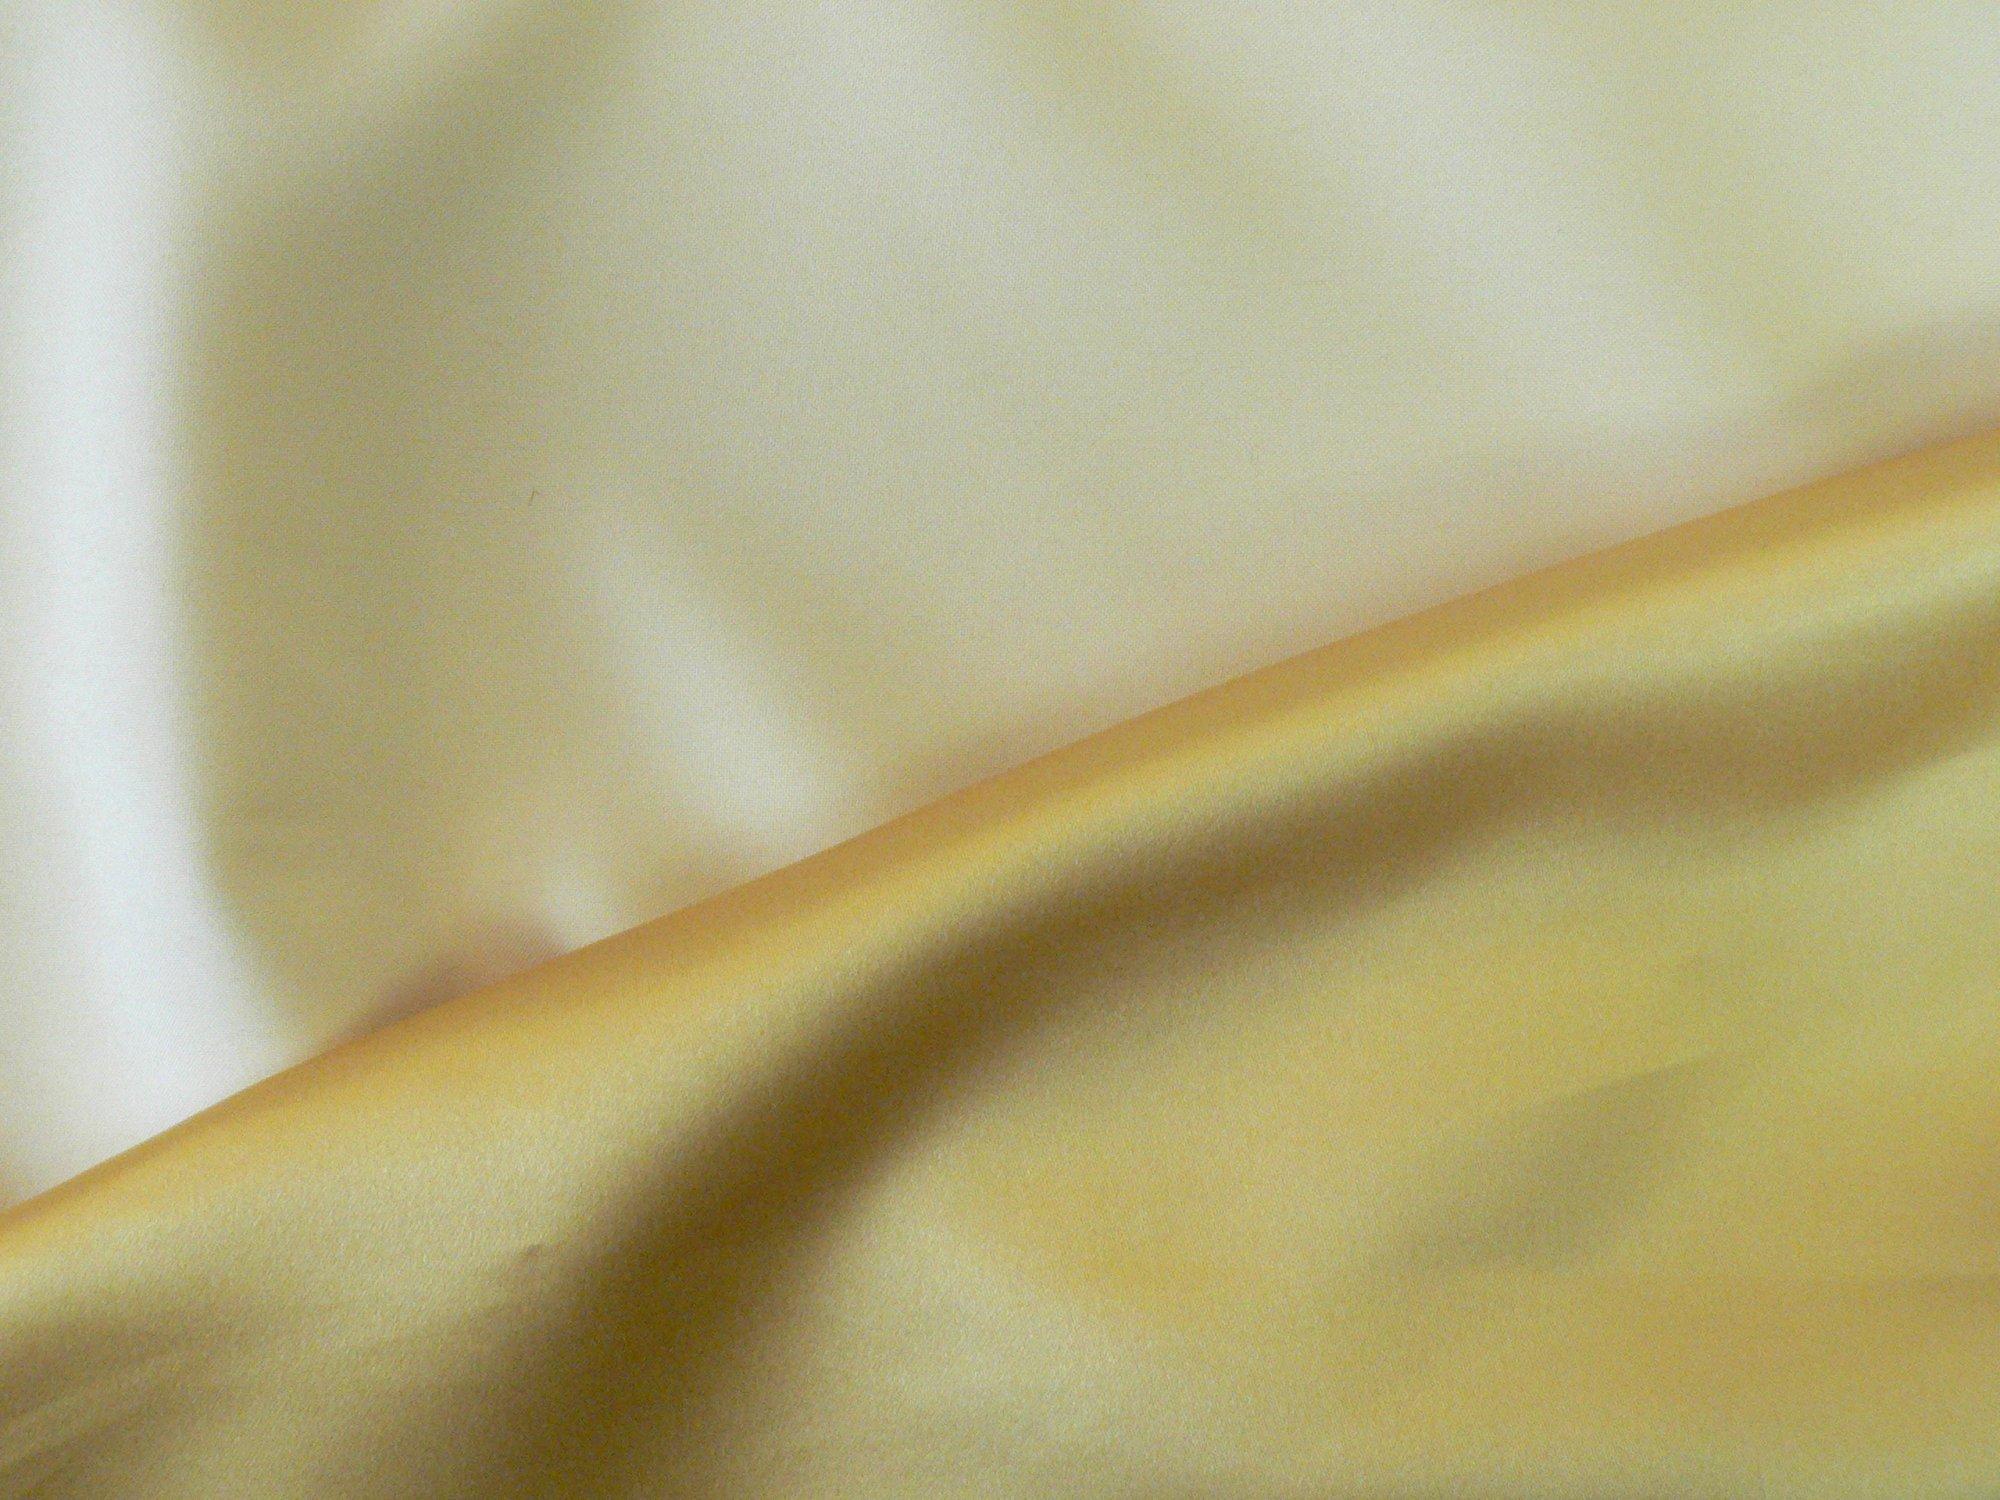 Satin OMBRE, yellow gradation light to dark